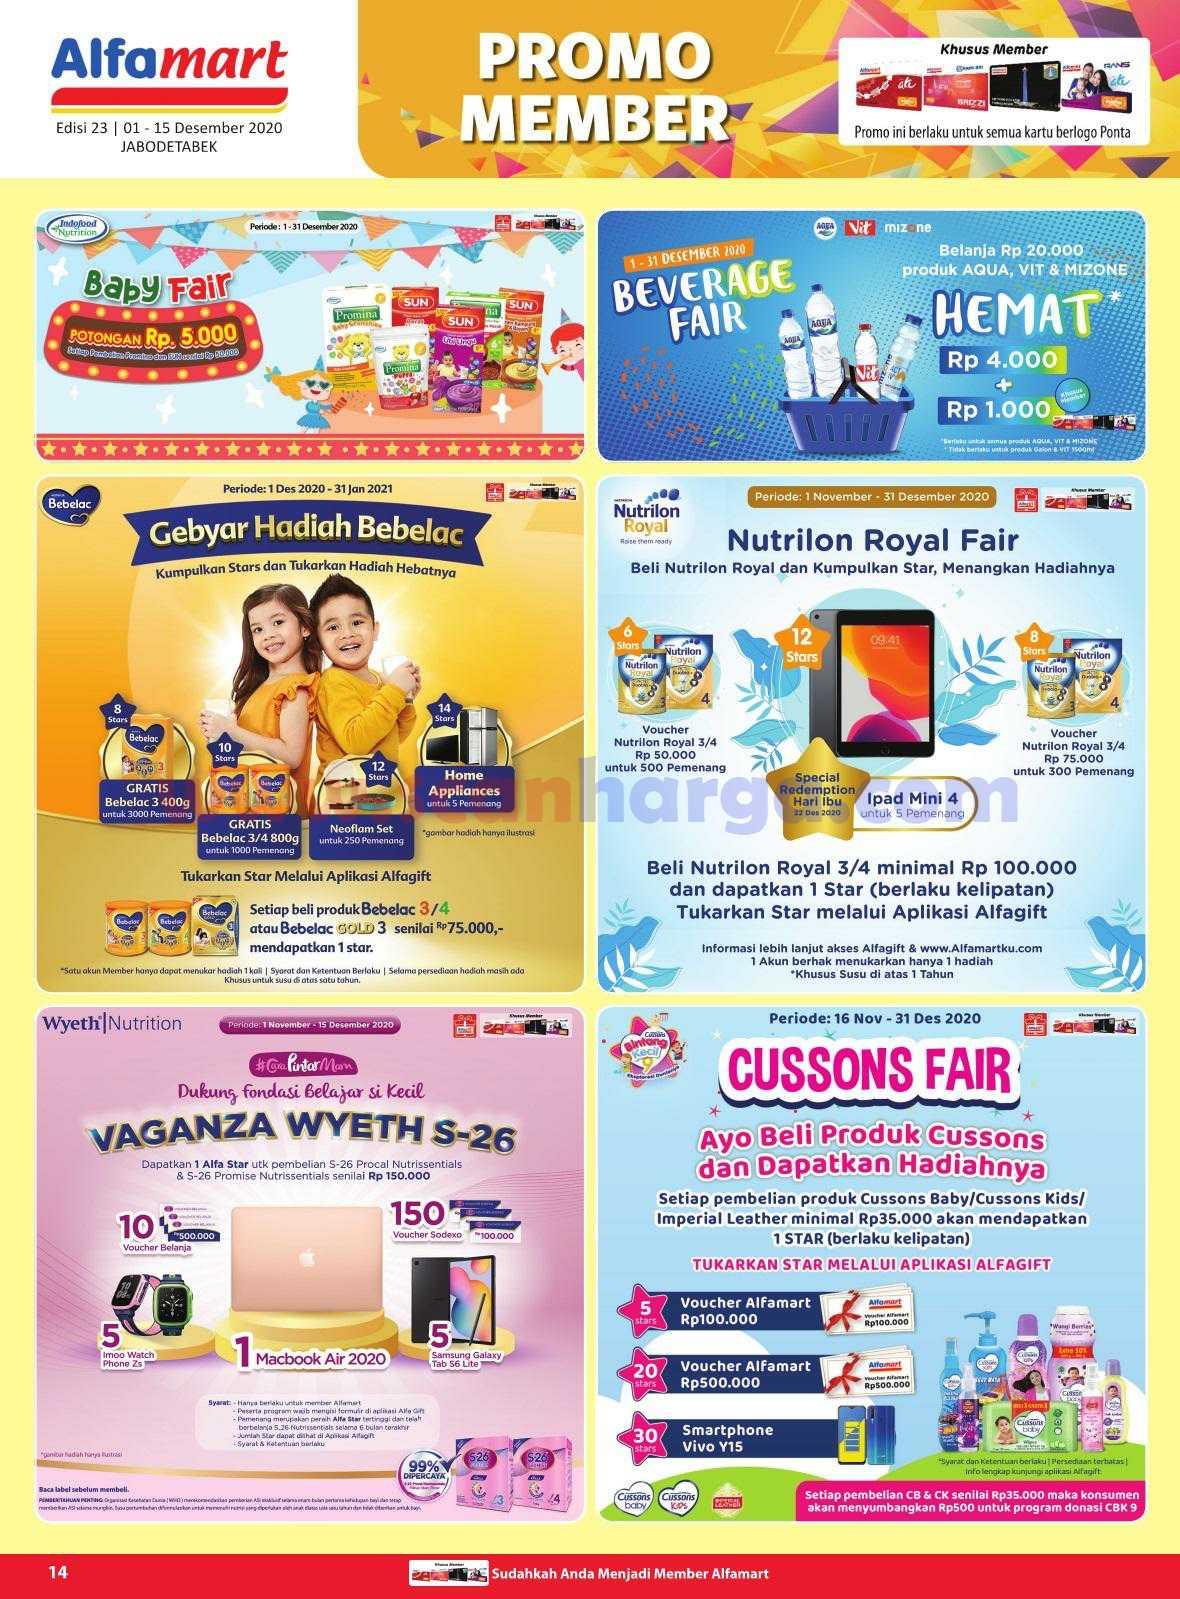 Katalog Promo Alfamart 1 - 15 Desember 2020 14